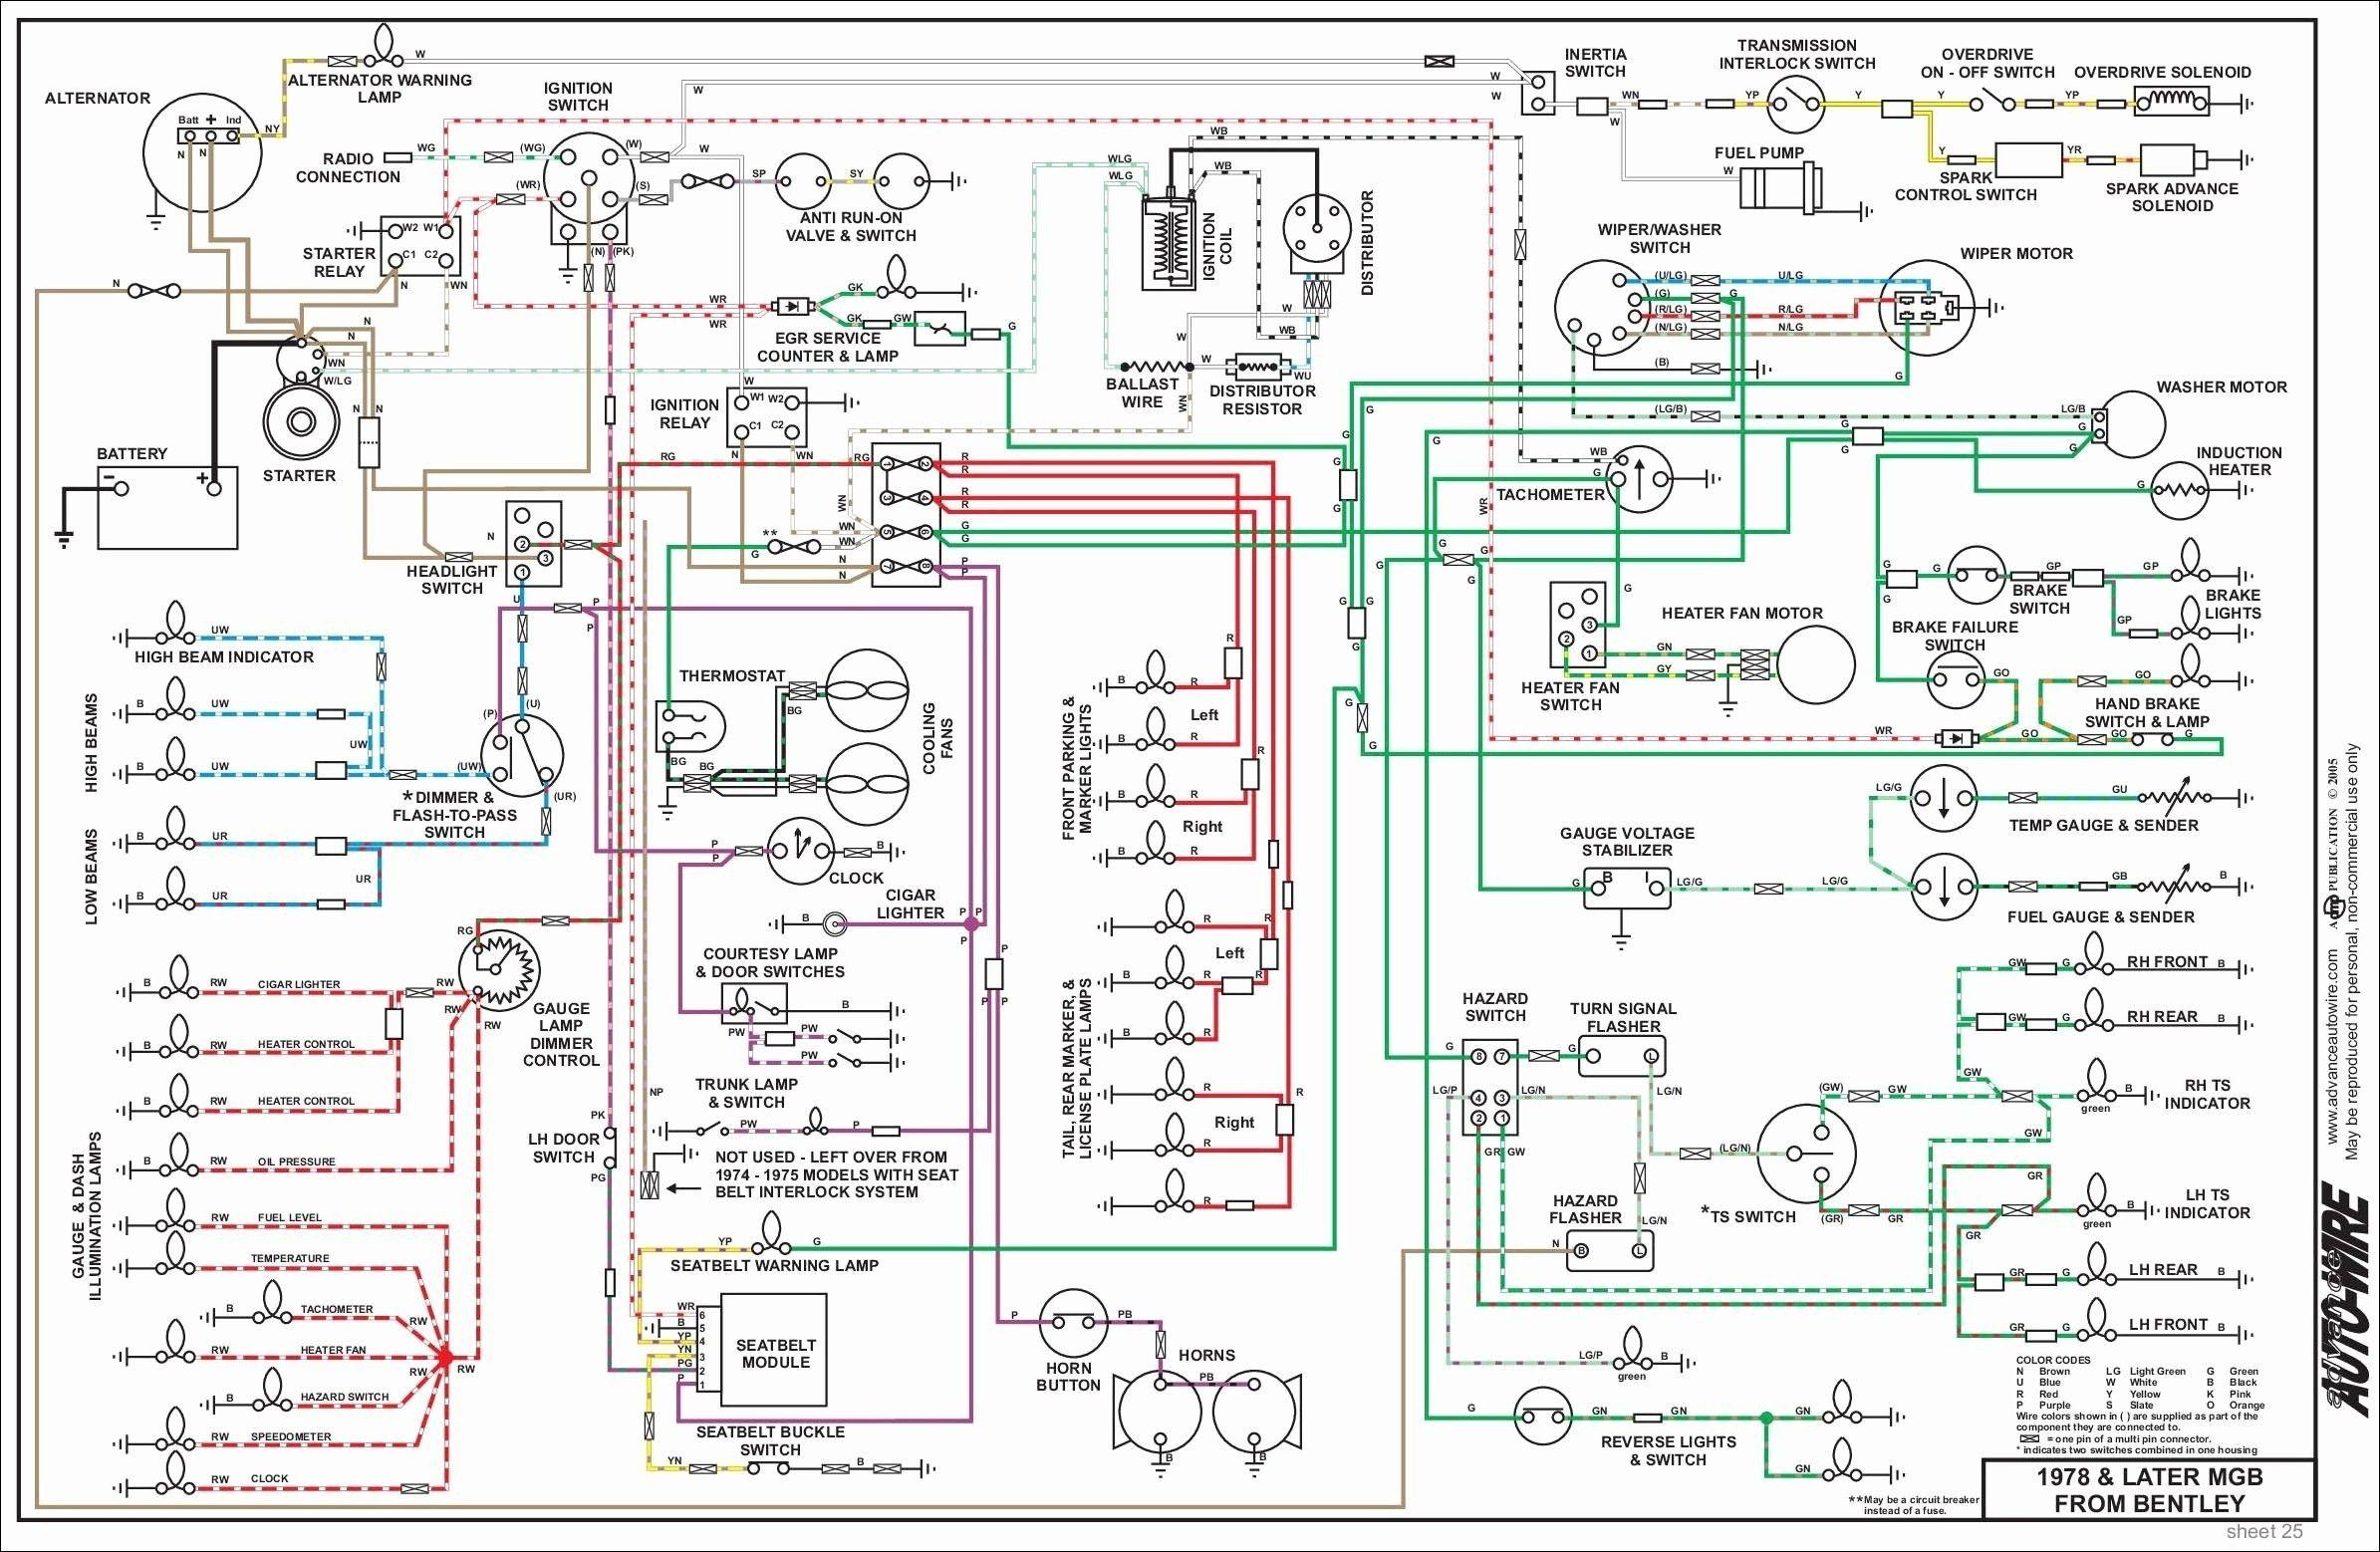 2016 Ram Wiring Diagram New Vans Aircraft Wiring Diagram Diagramsample Of 2016 Ram Wiring Diagram